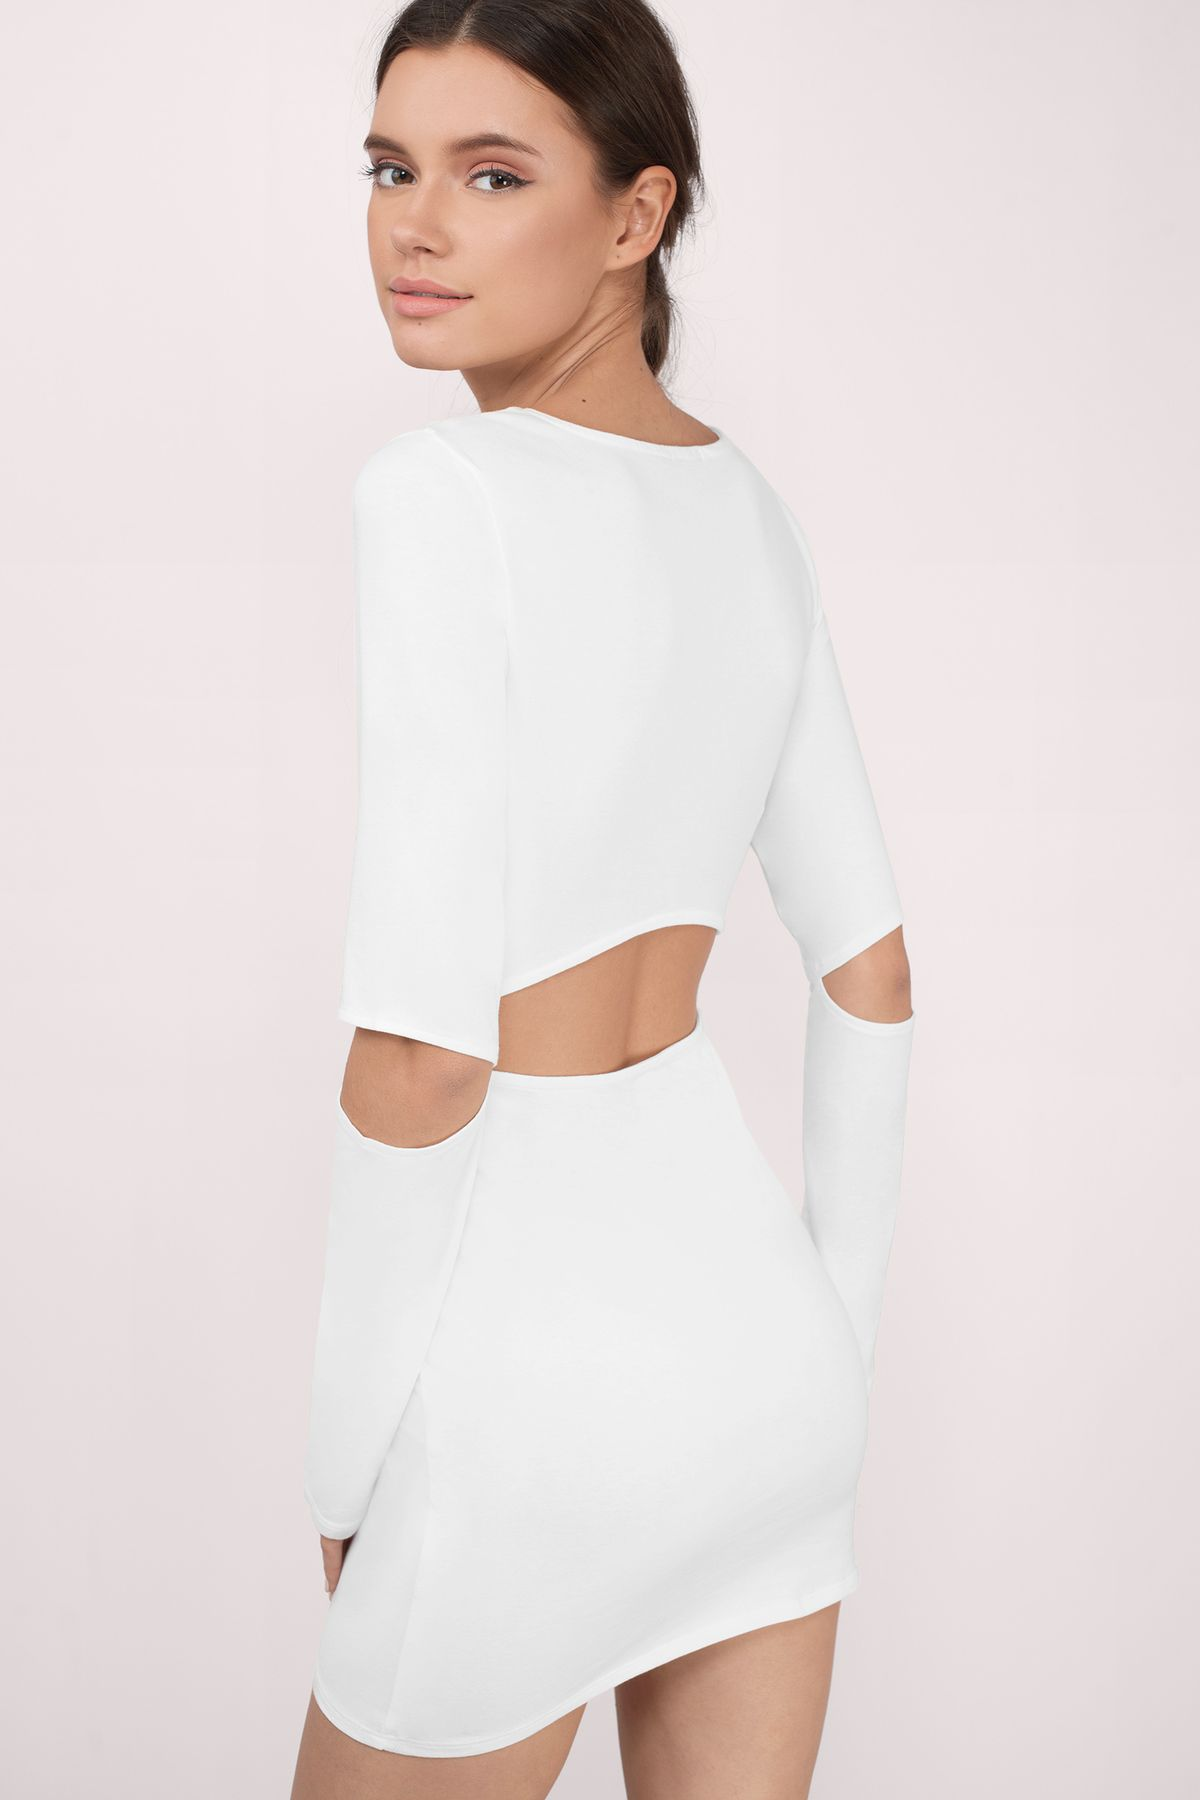 Glimpses Of Me Dress at Tobi.com #shoptobi